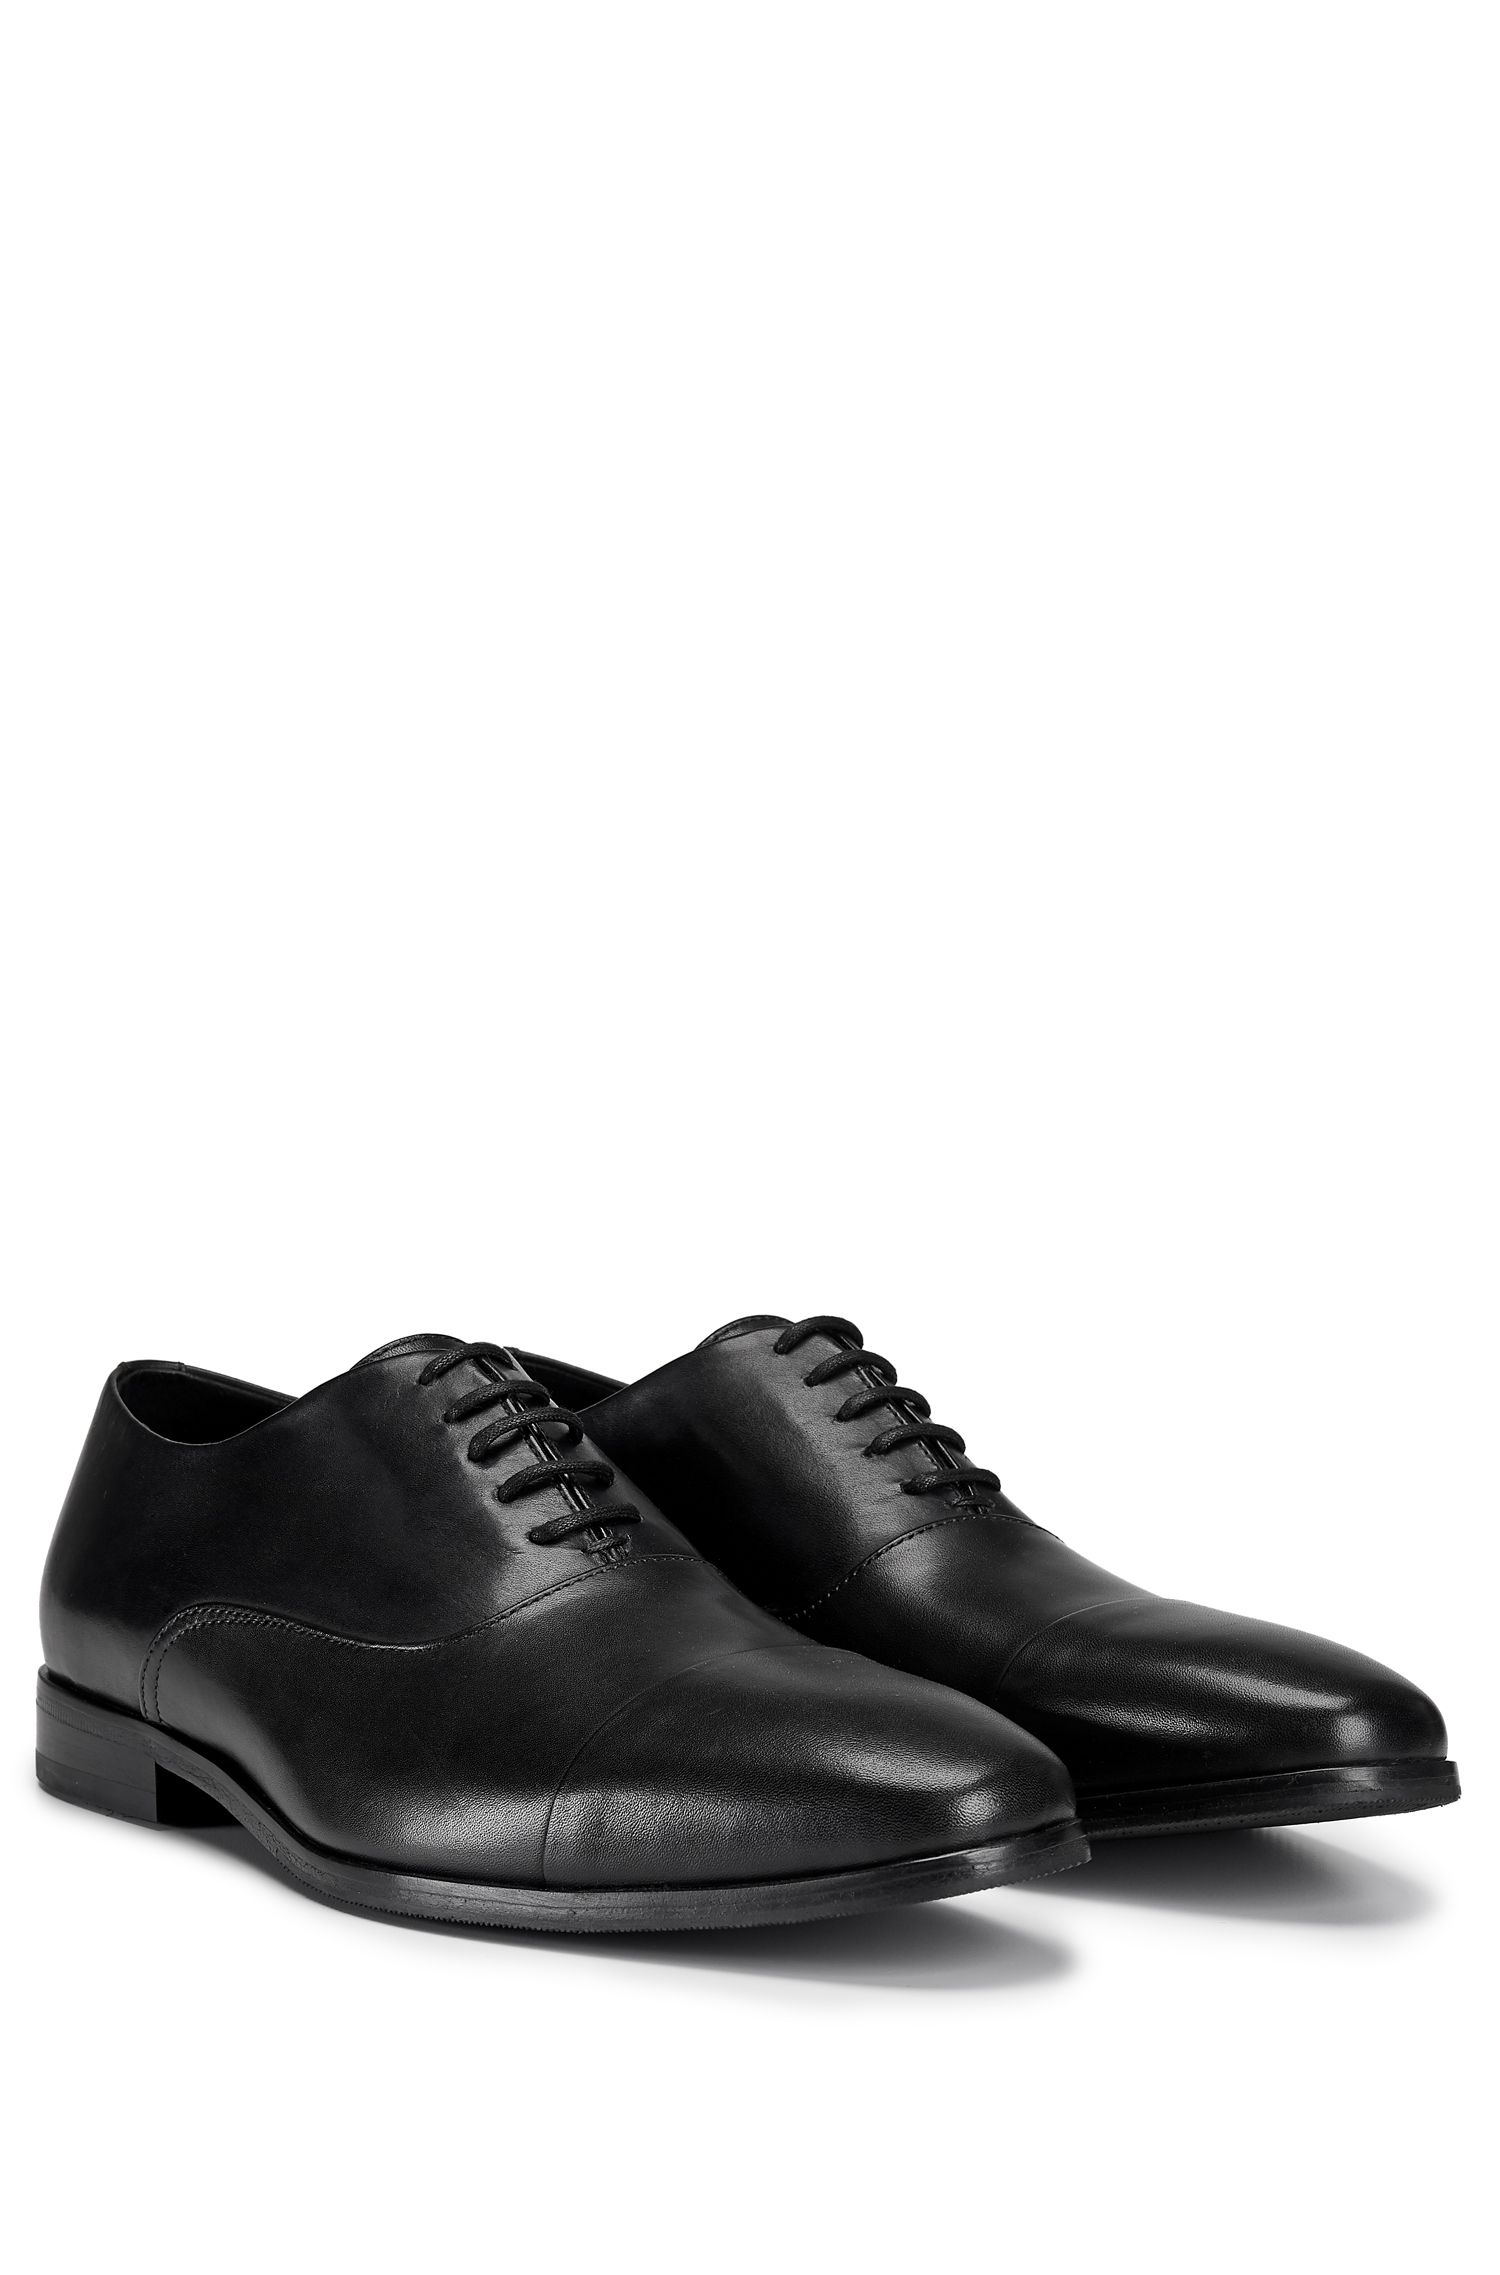 Leather Oxford Dress Shoe | Highline Oxfr Buct, Black